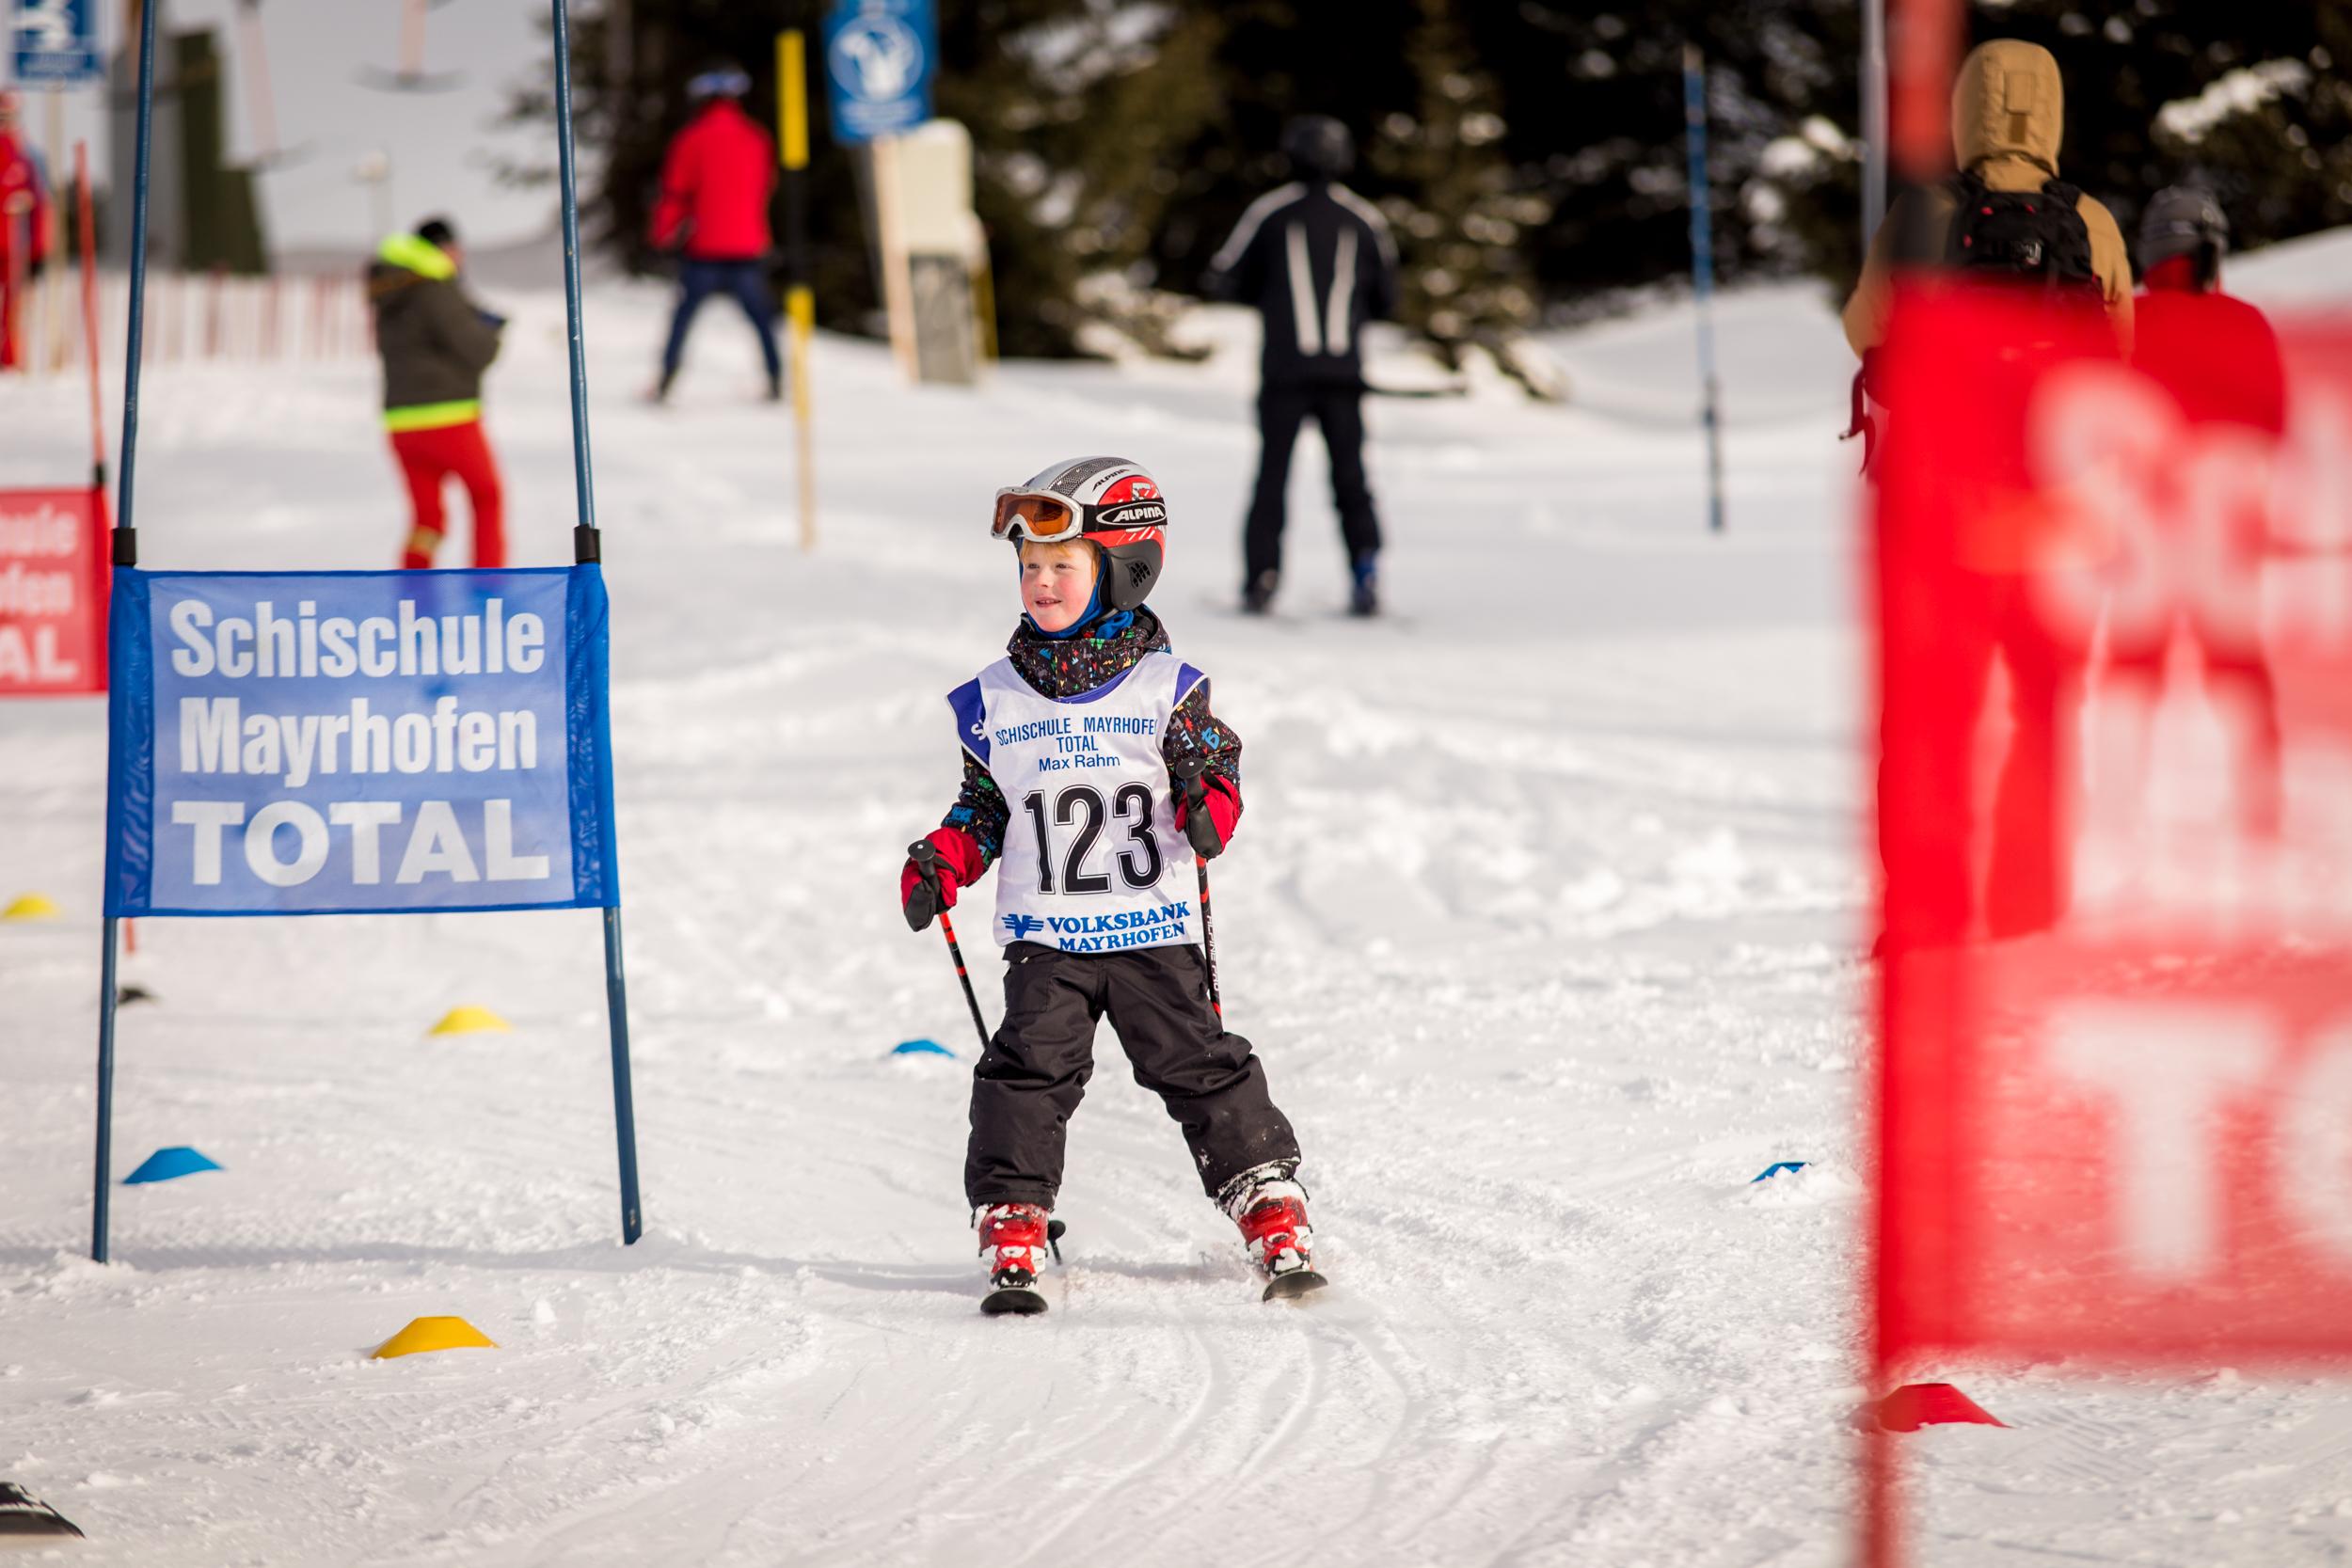 ski race 16_0084.jpg